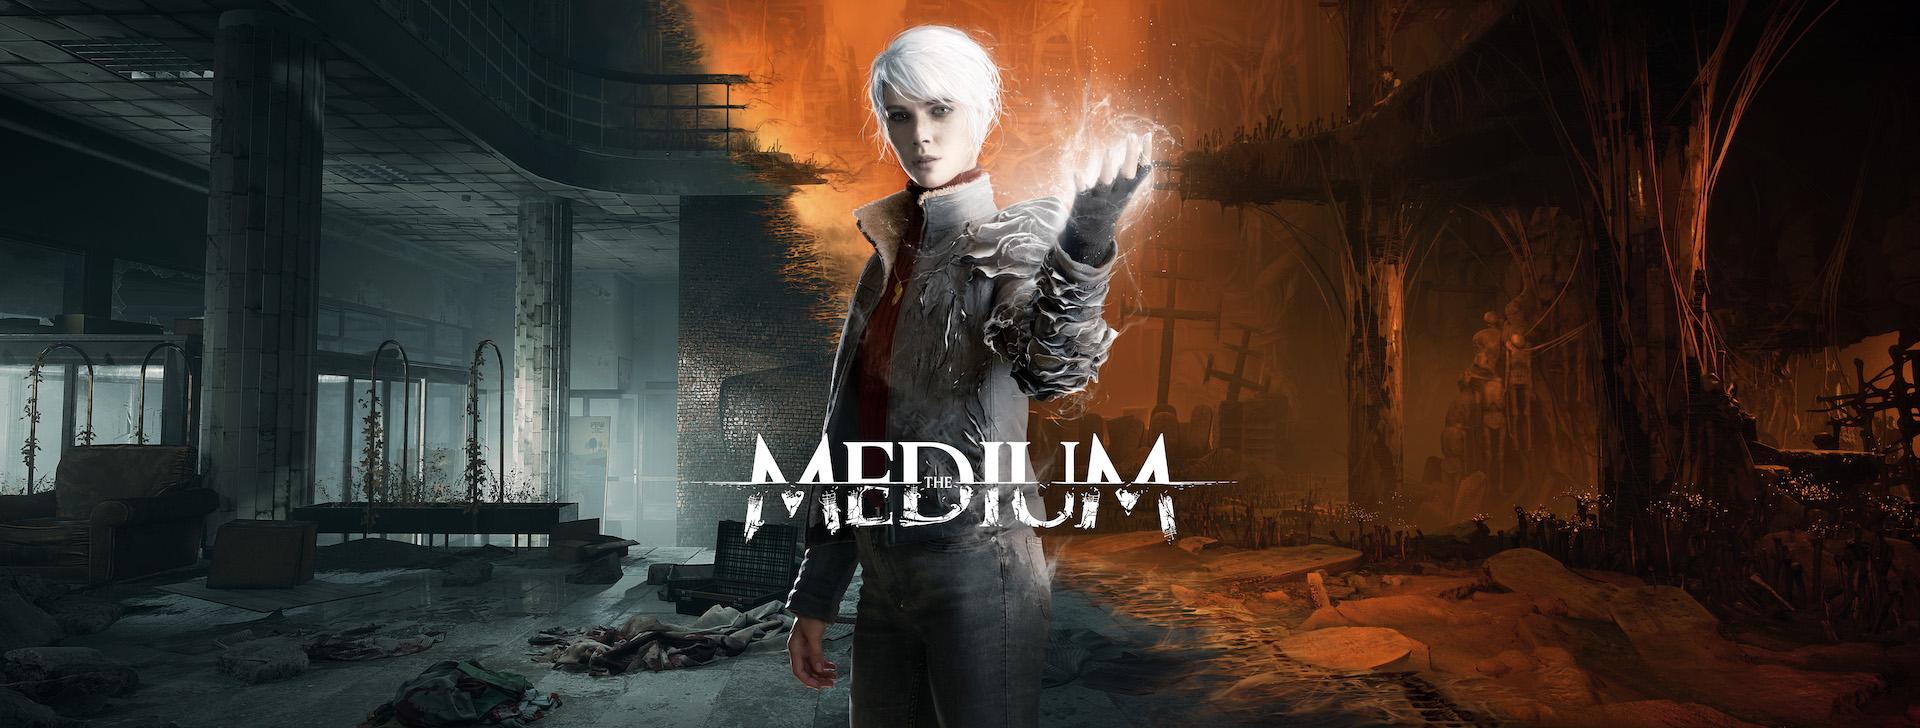 The Medium (Медиум)